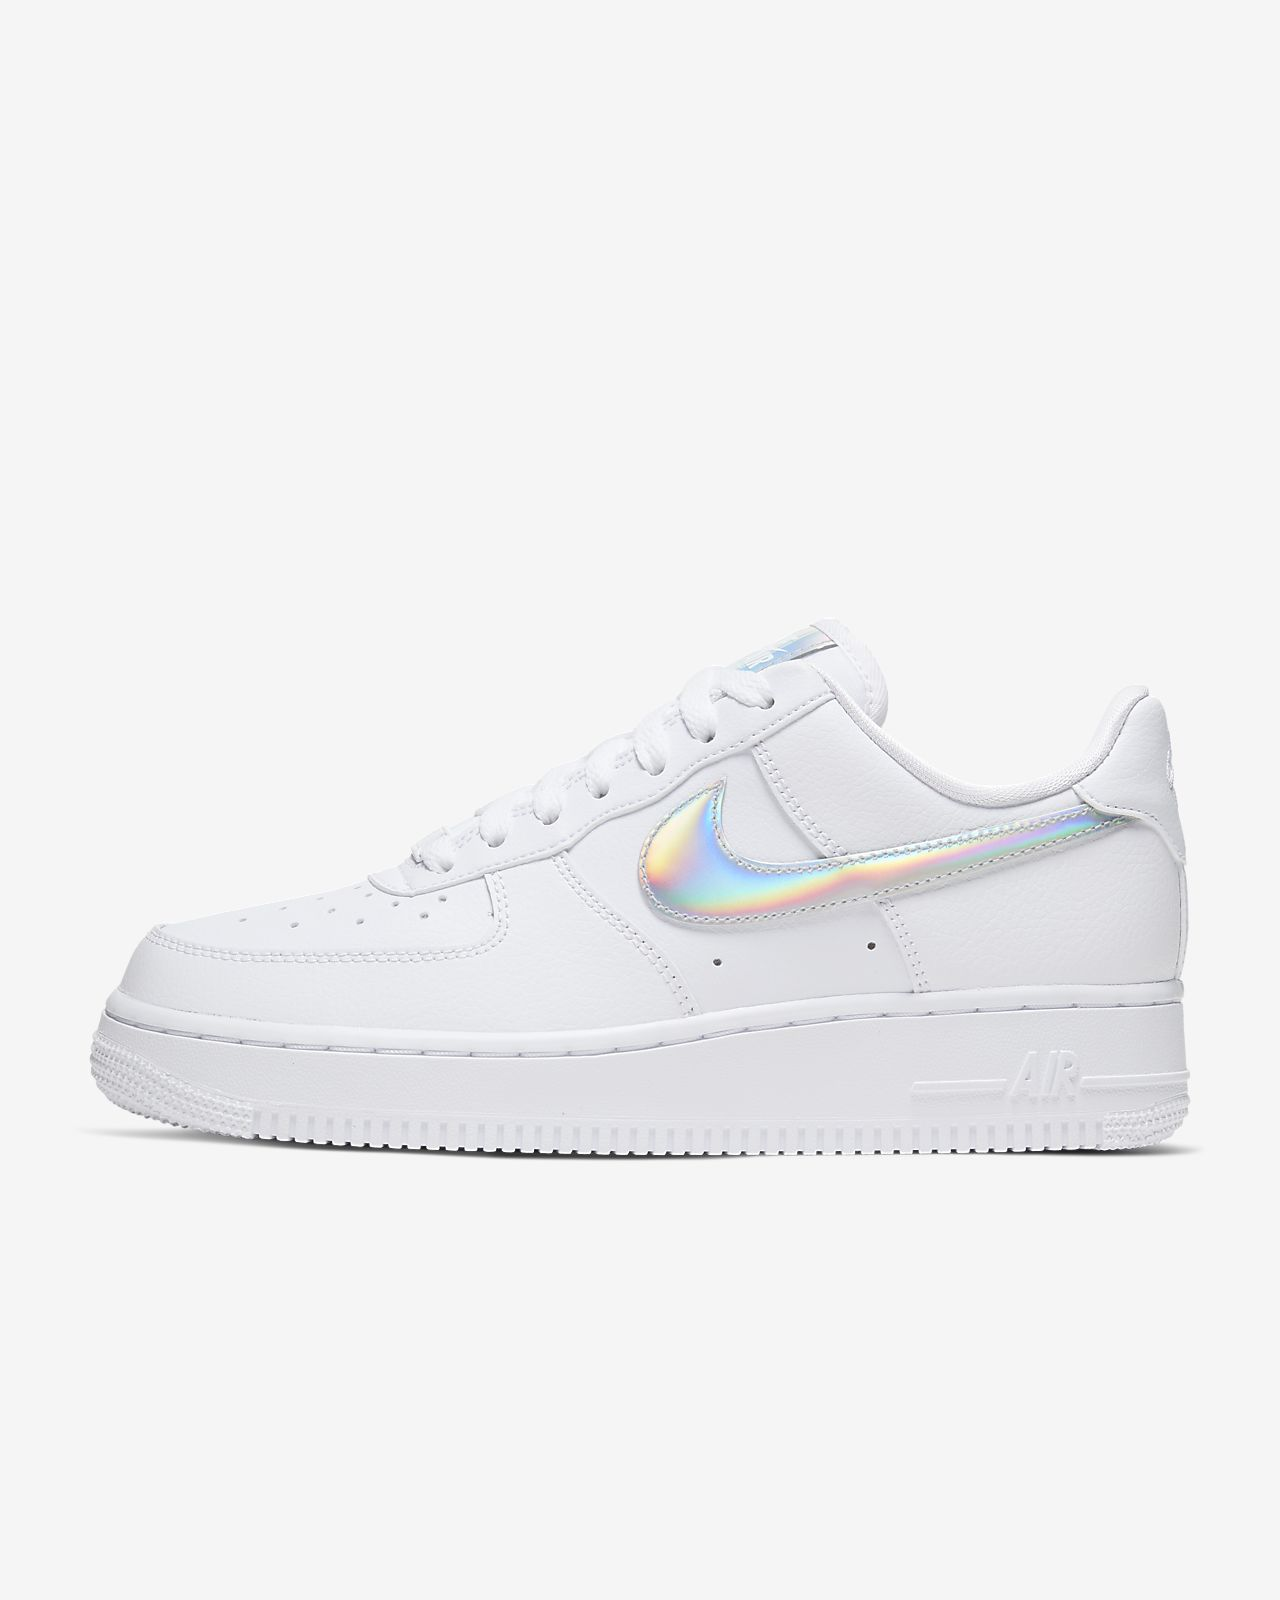 NIKE AIR FORCE 1 '07 ESSENTIAL AO2132 102 | kolor BIAŁY | Damskie Sneakersy | Buty w ✪ Sklep Sizeer ✪